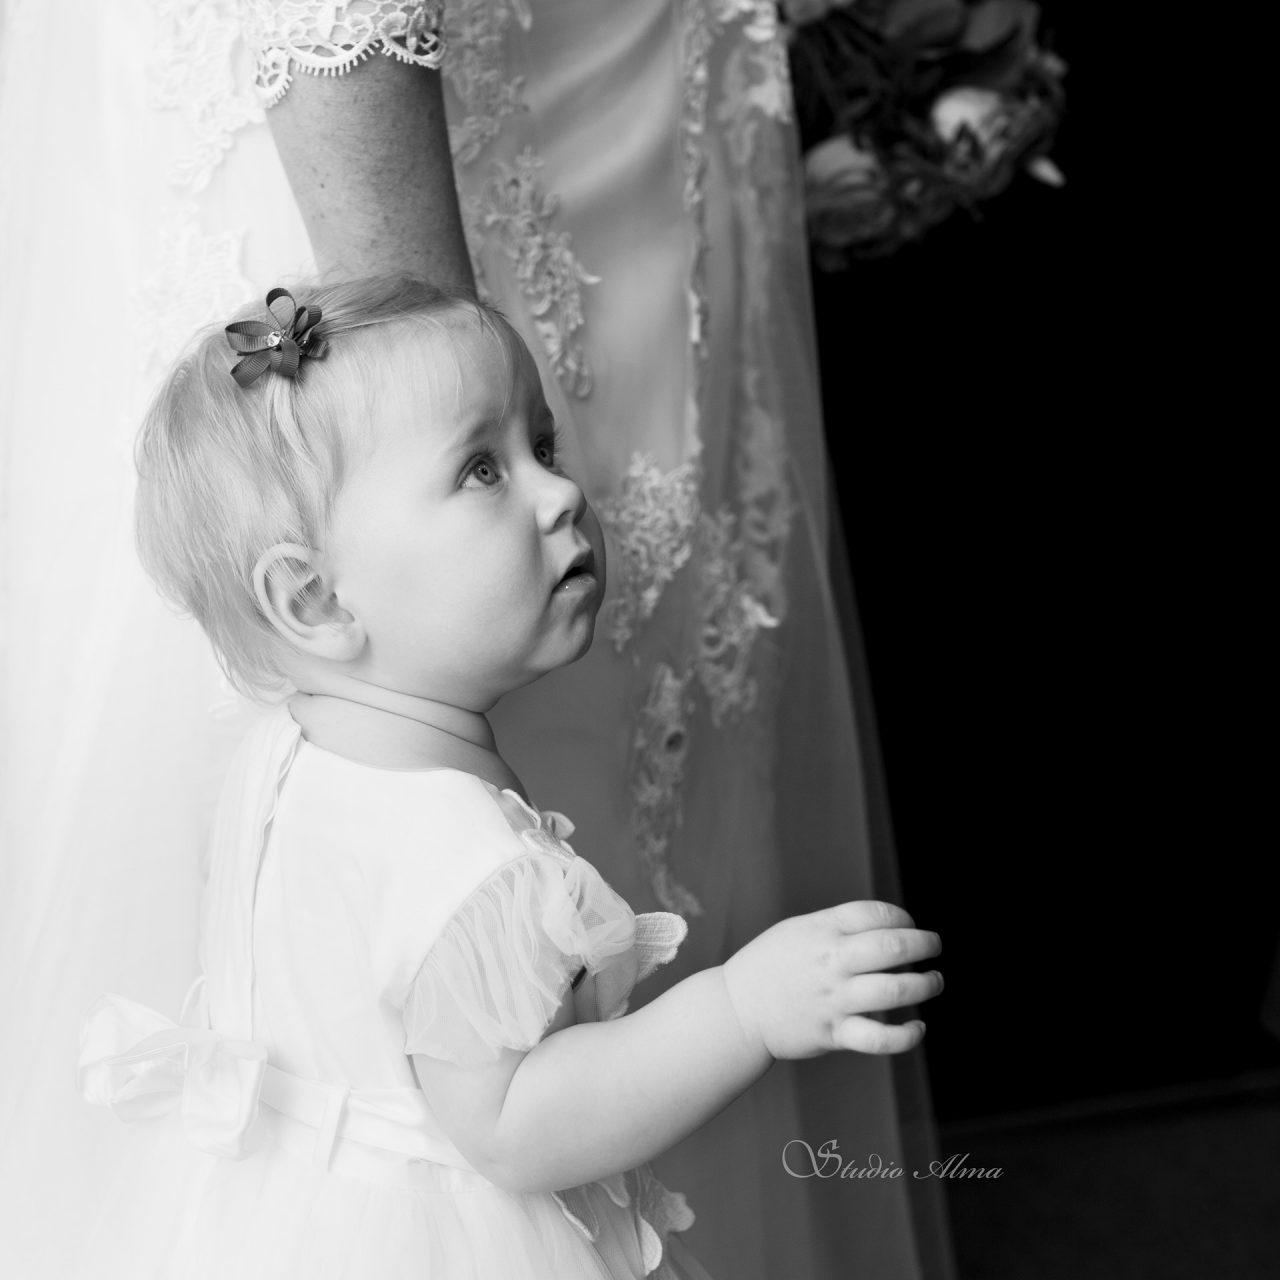 studioalma-bryllup-brudepike